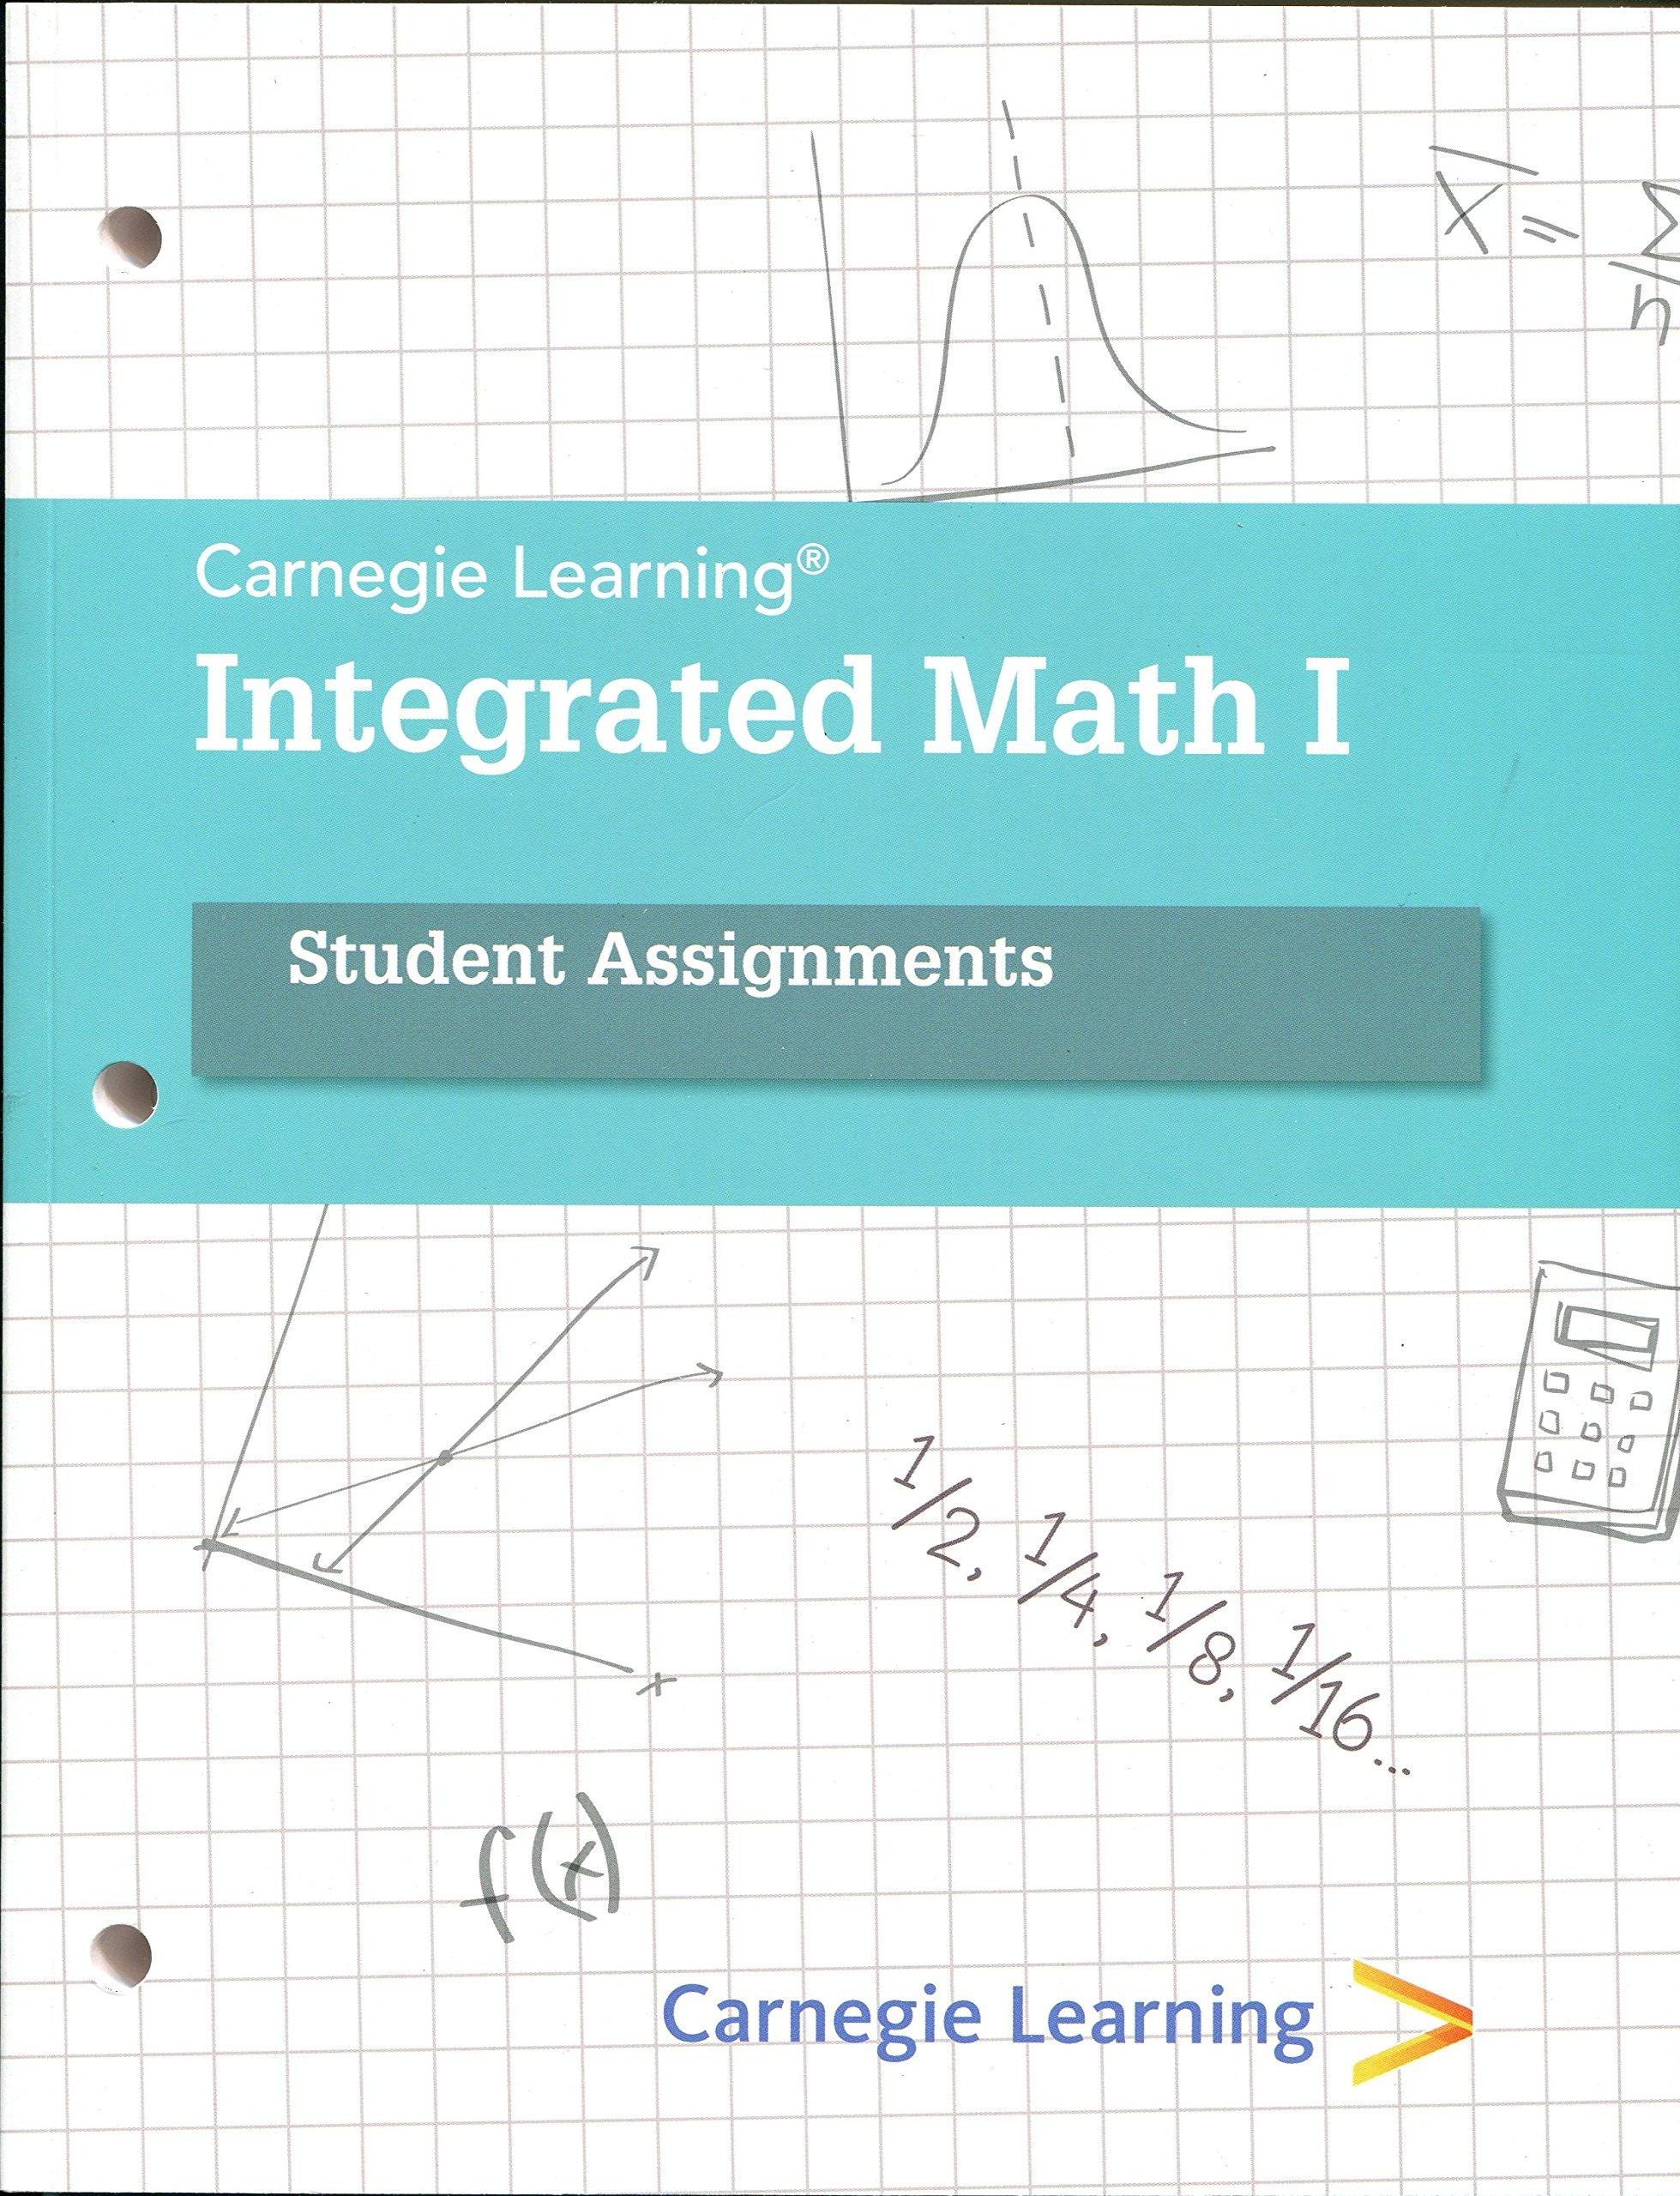 Integrated Math I Carnegie Learning: 9781609721596: Amazon.com: Books